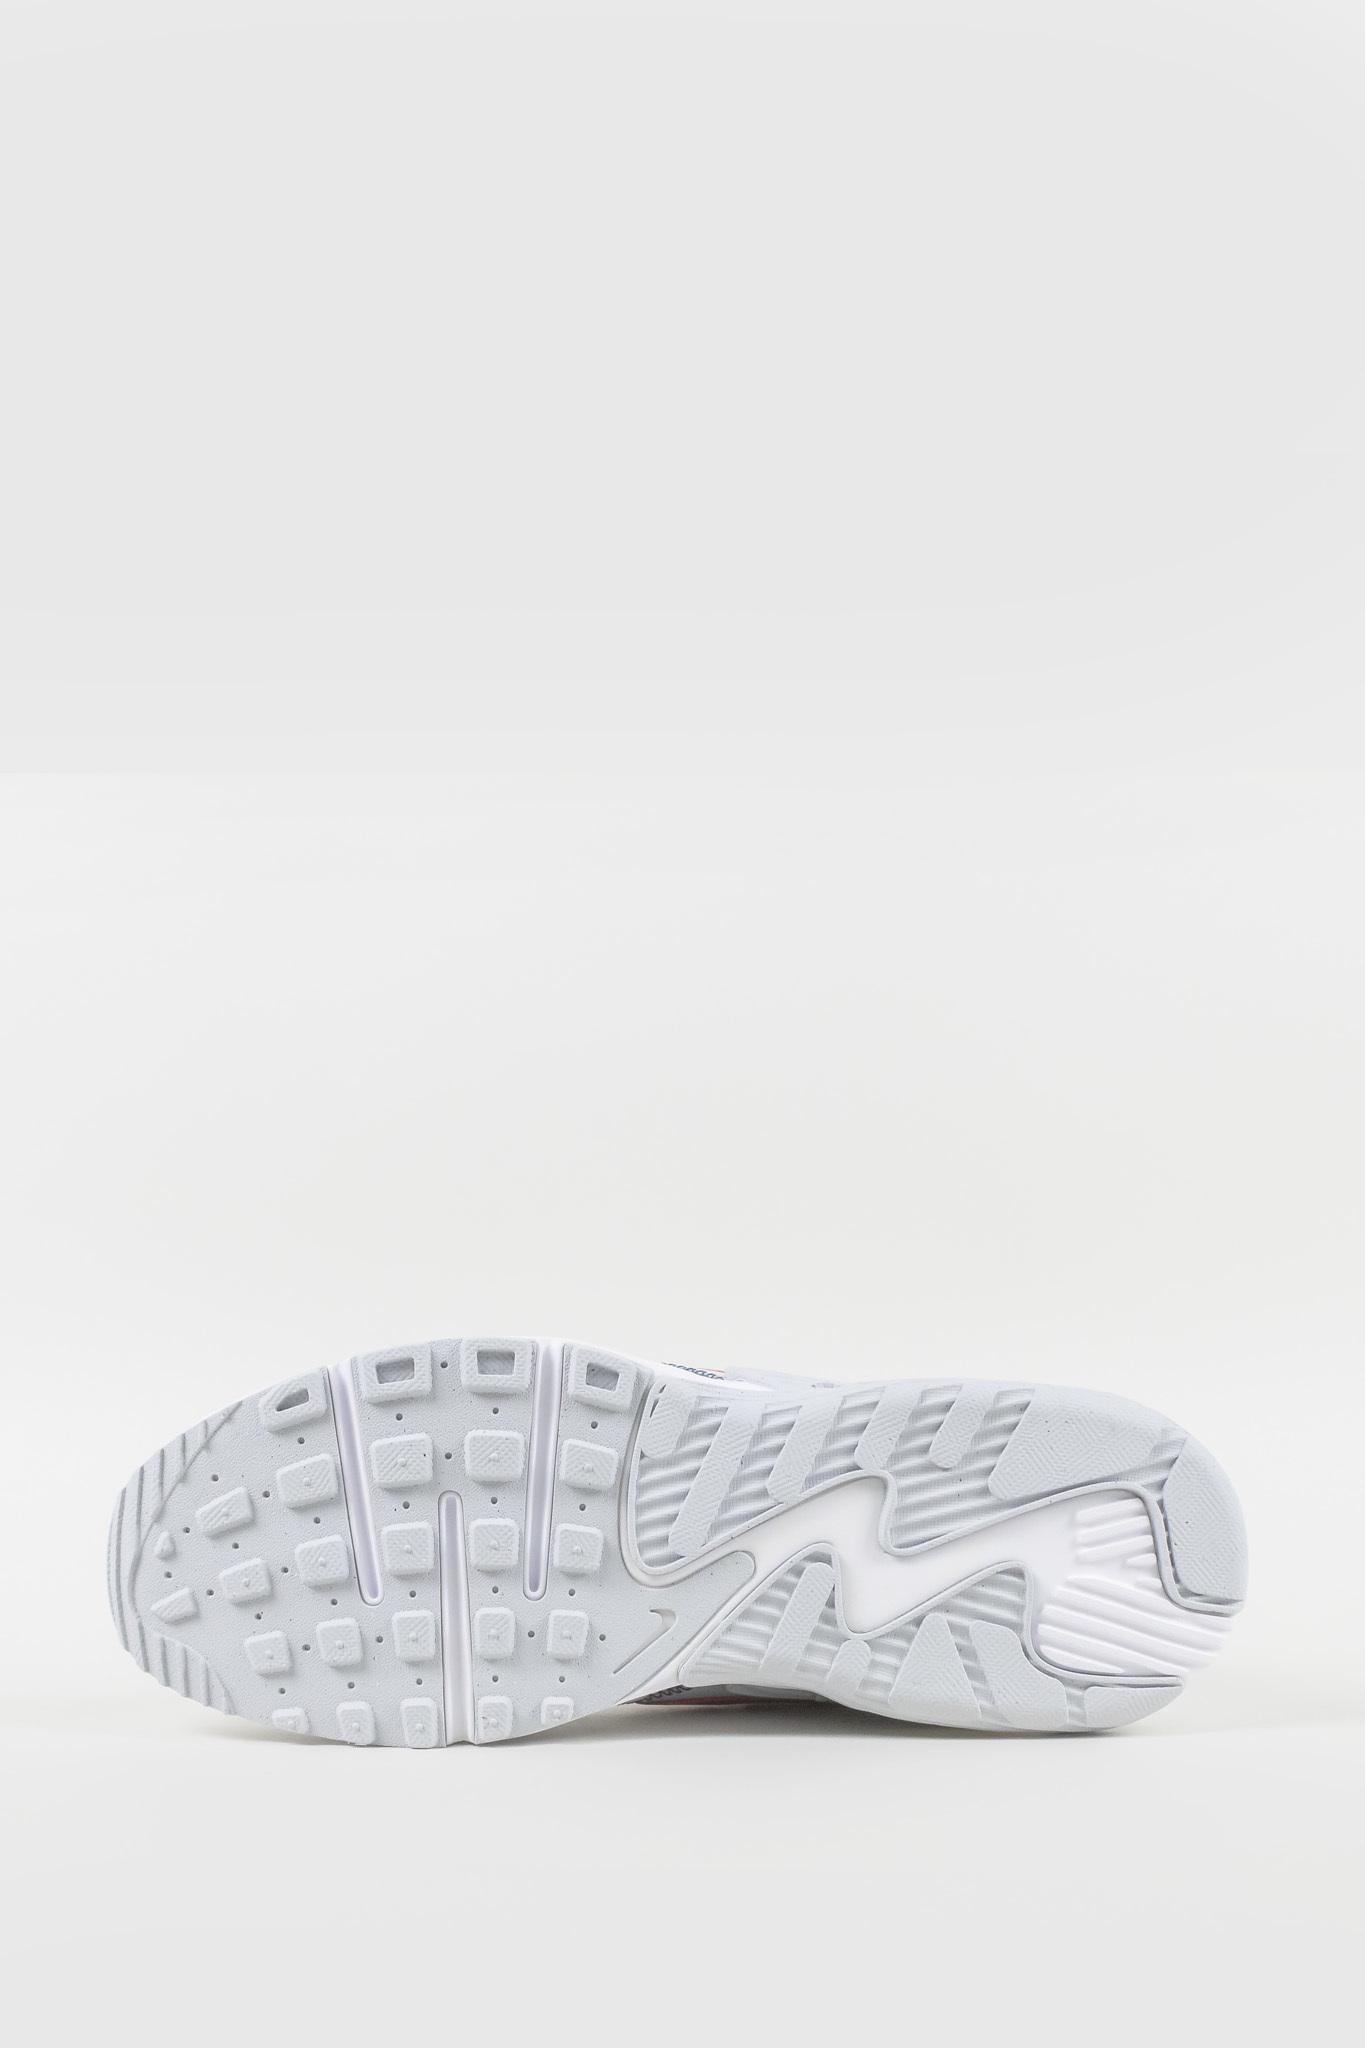 Nike   Кроссовки   Белая кожа